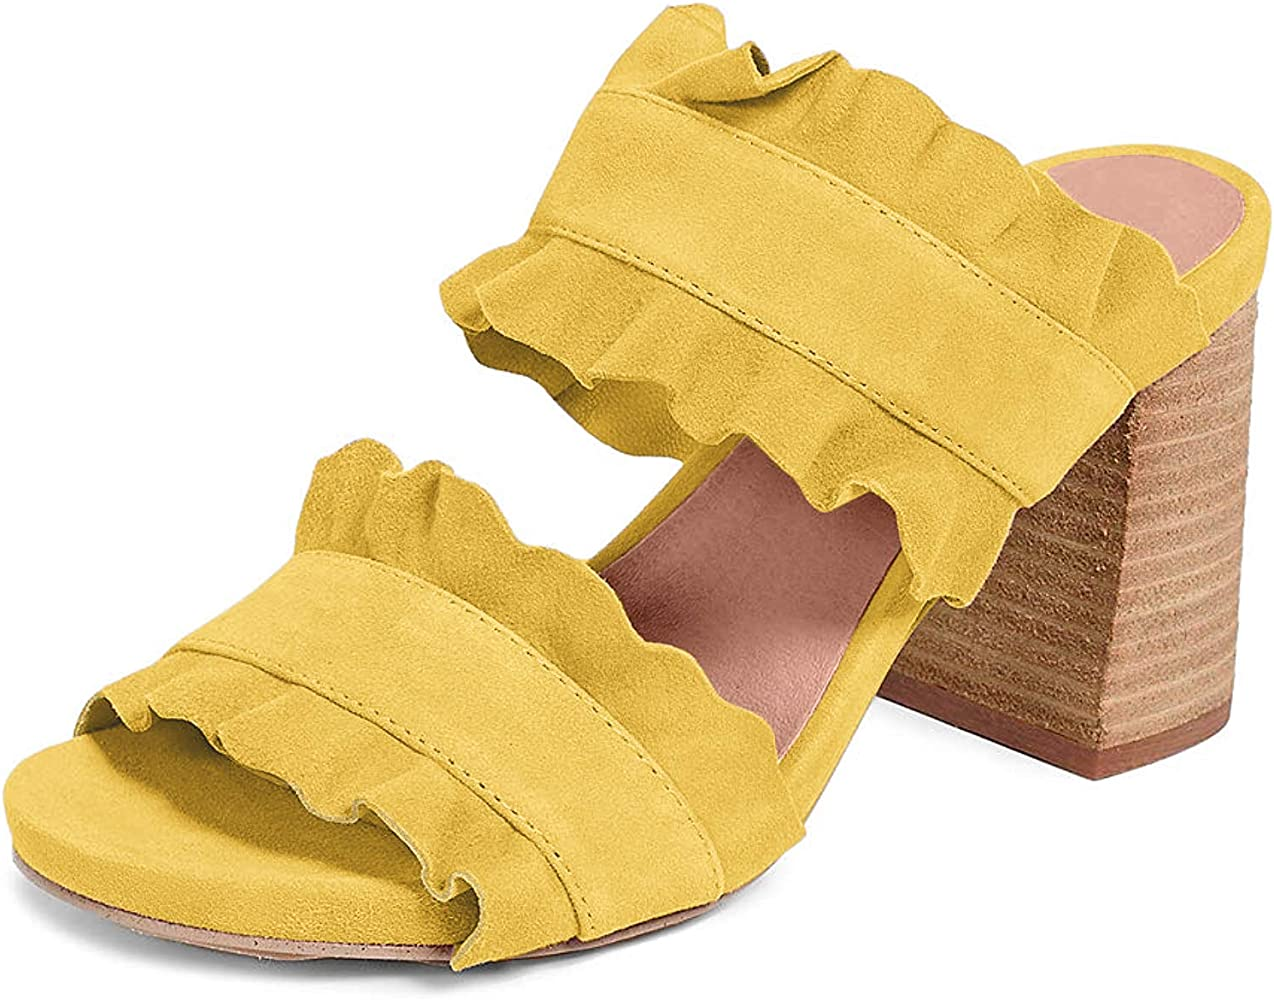 Free People Rosie Ruffle Heel Yellow 38